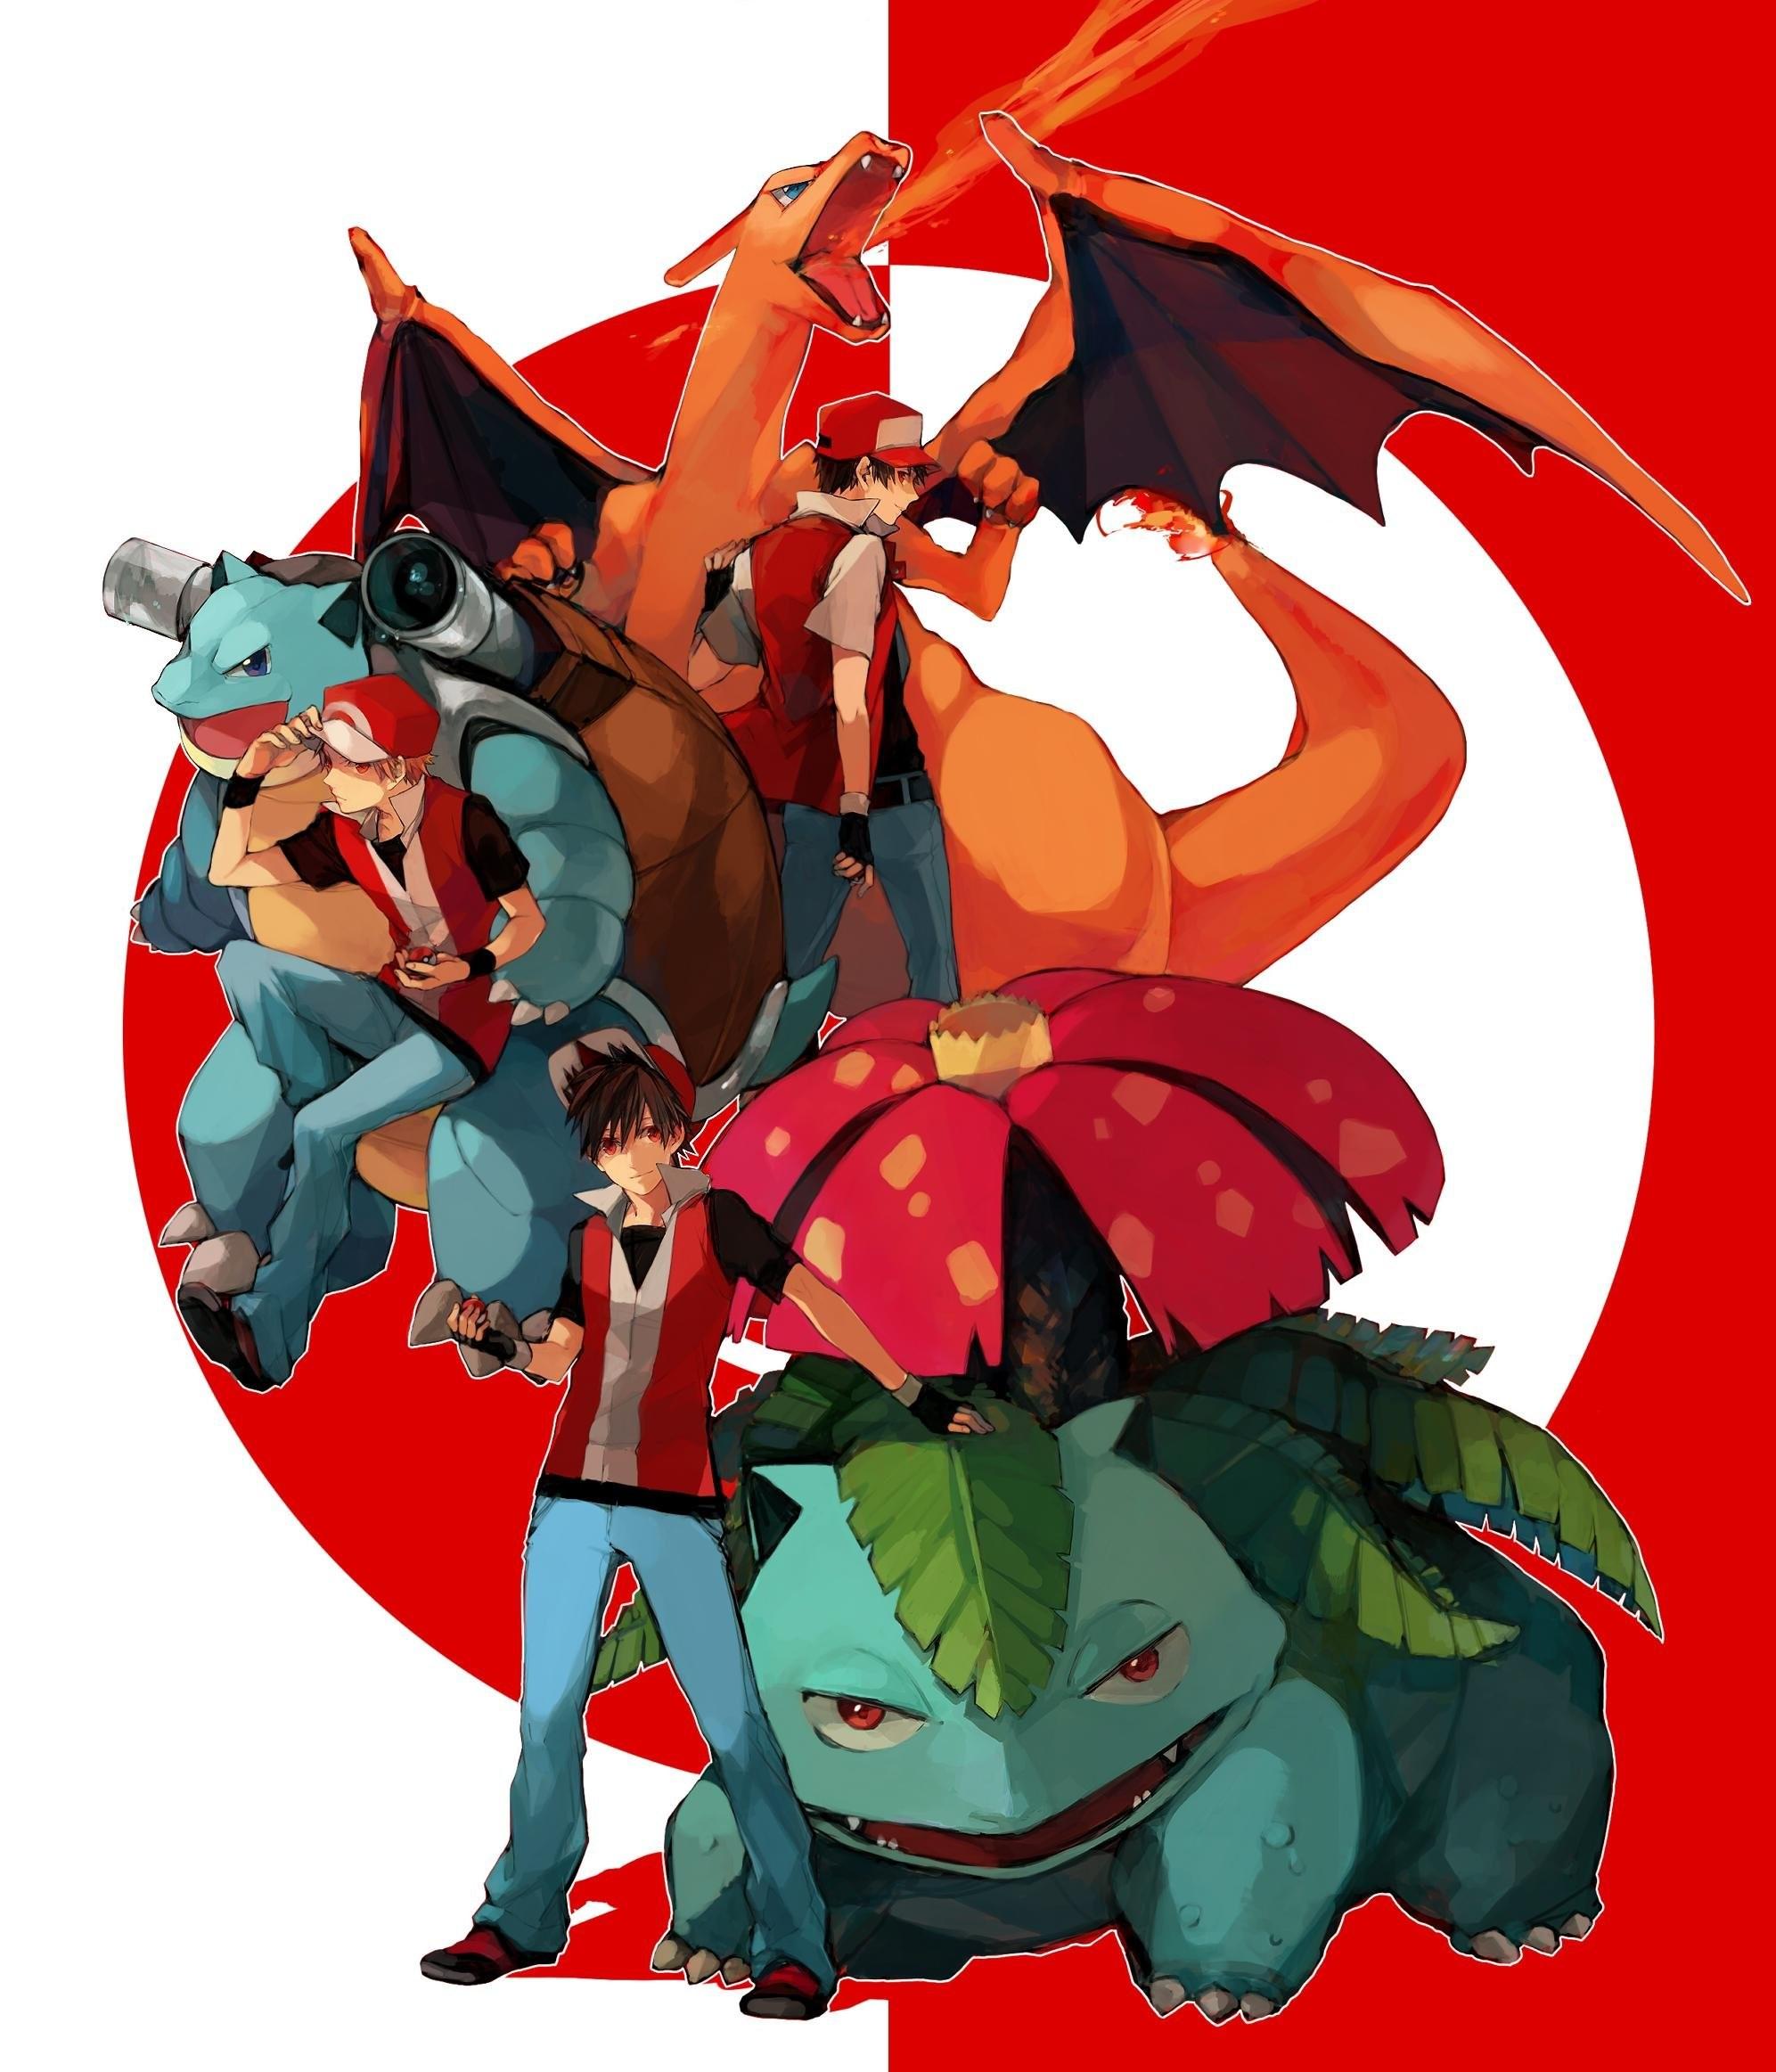 Pokemon Charizard vs Blastoise HD Wallpapers (74+ images)